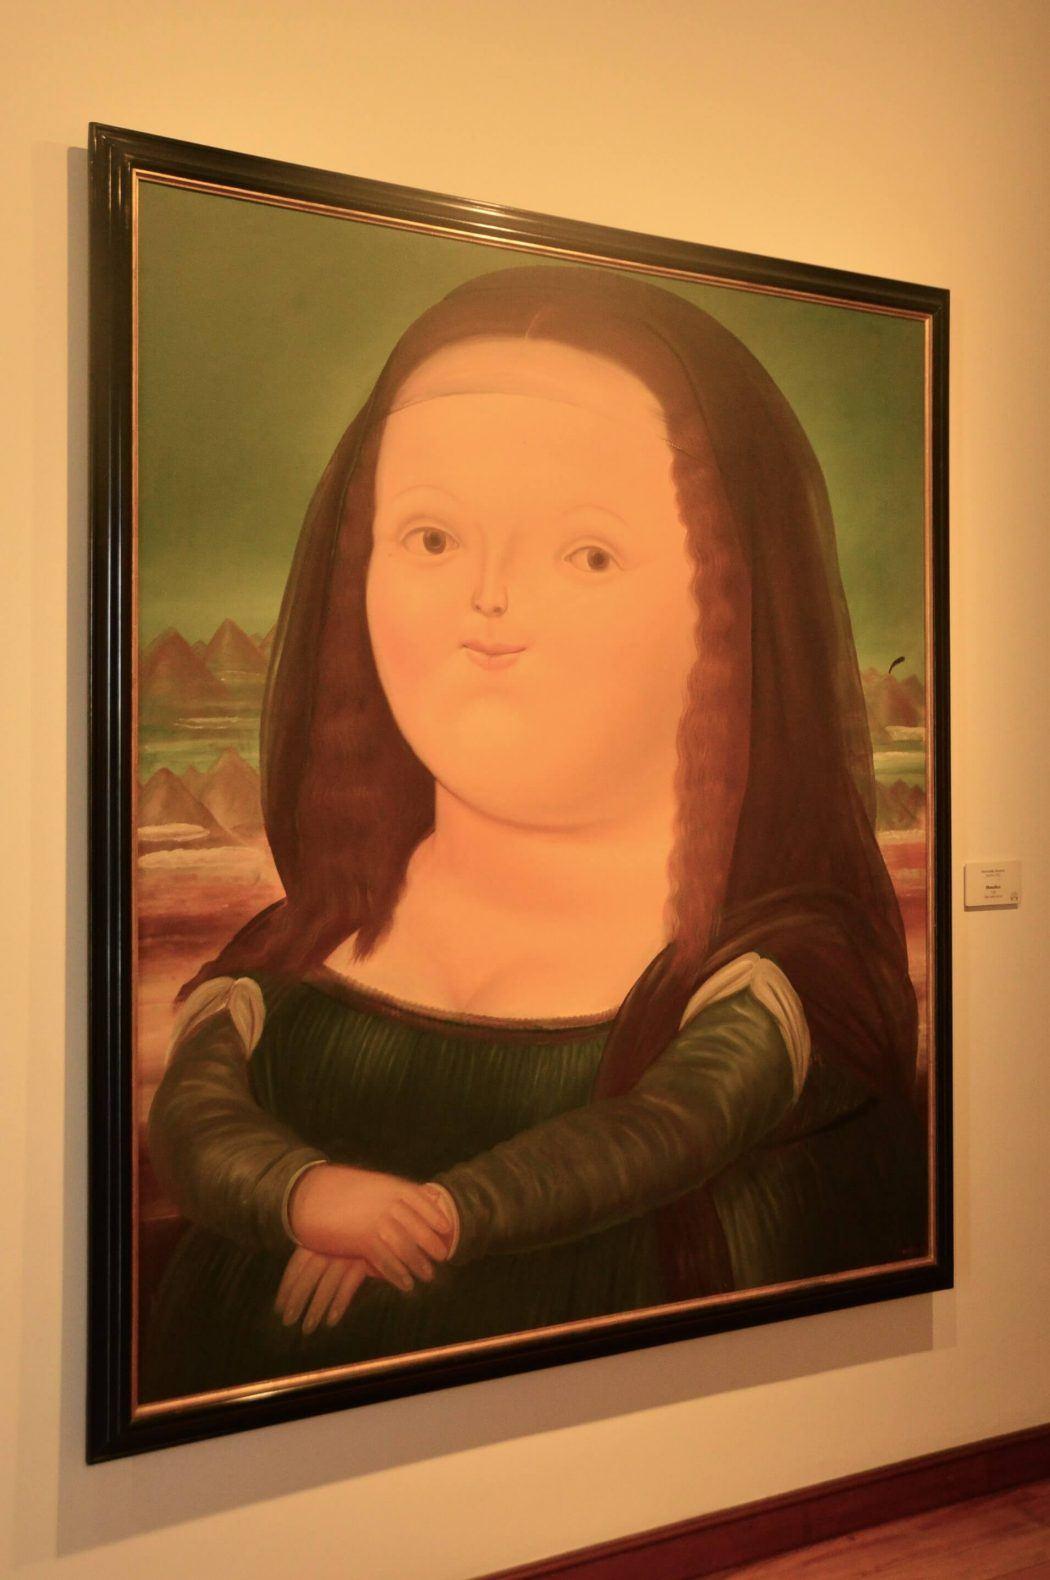 Fernando Botero version of Mona Lisa painting